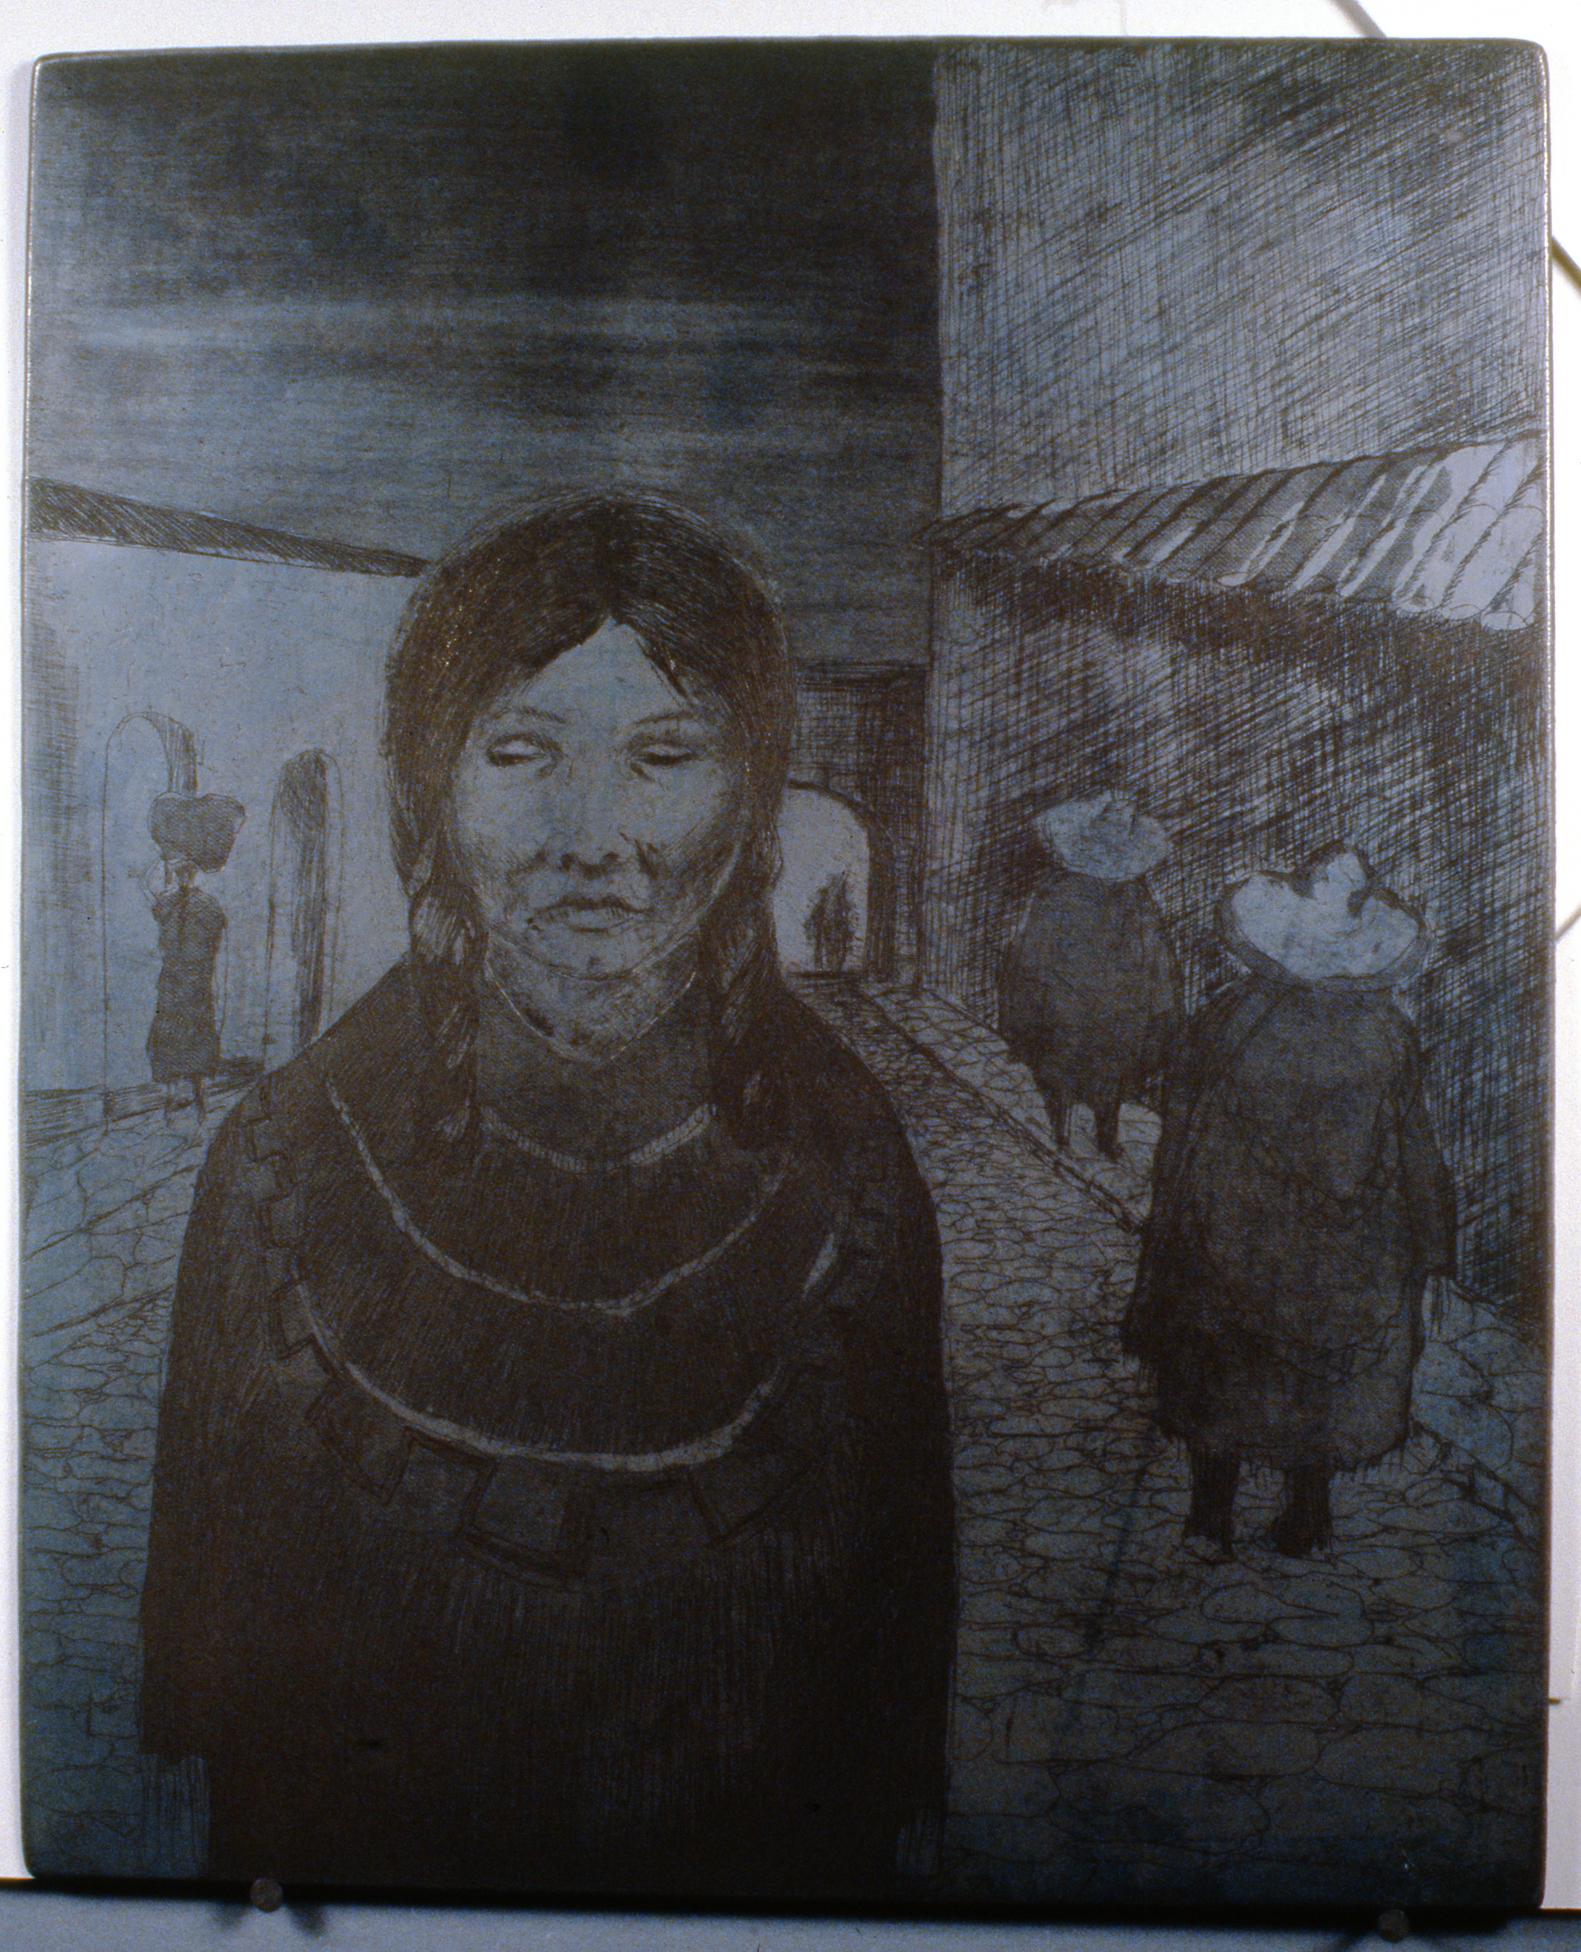 Evening in Mexico , 1978, Minn Sjølseth, metal plate, 30.5 x 25cm, 1996.02.06